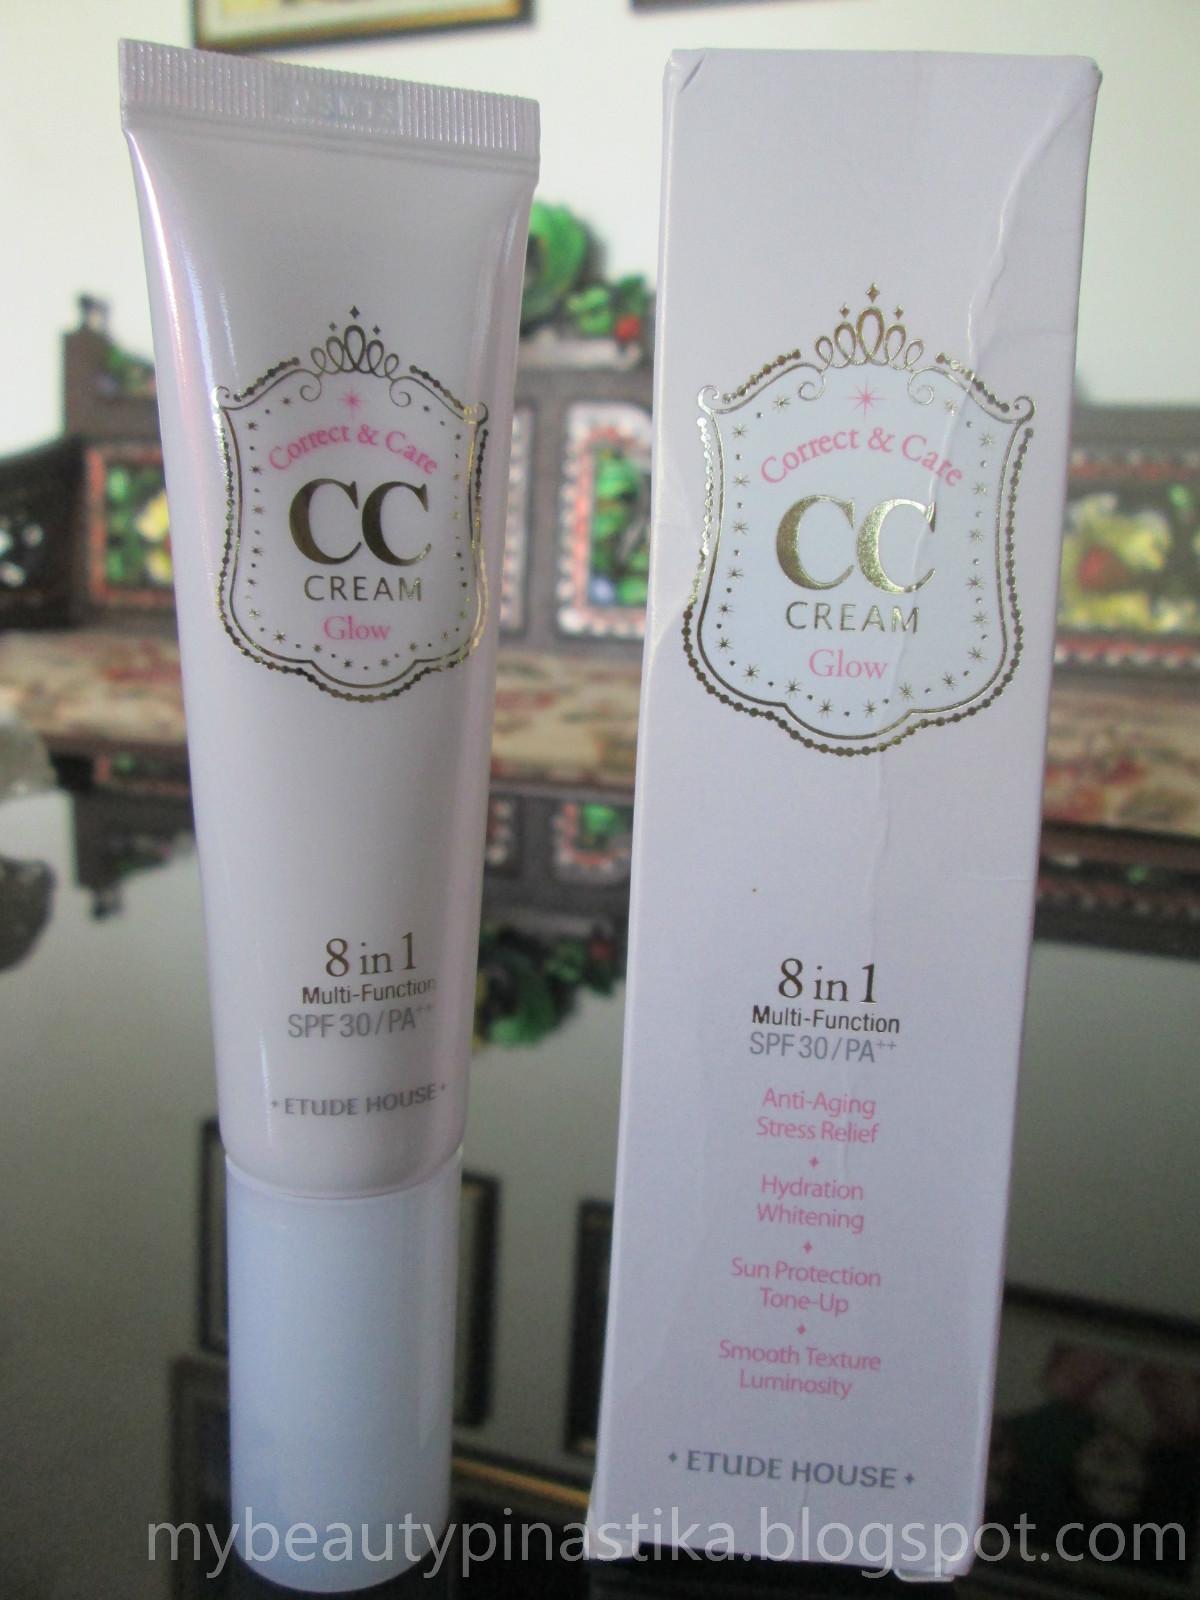 Pinastika Beauty Blog Etude House Cc Cream 02 Glow